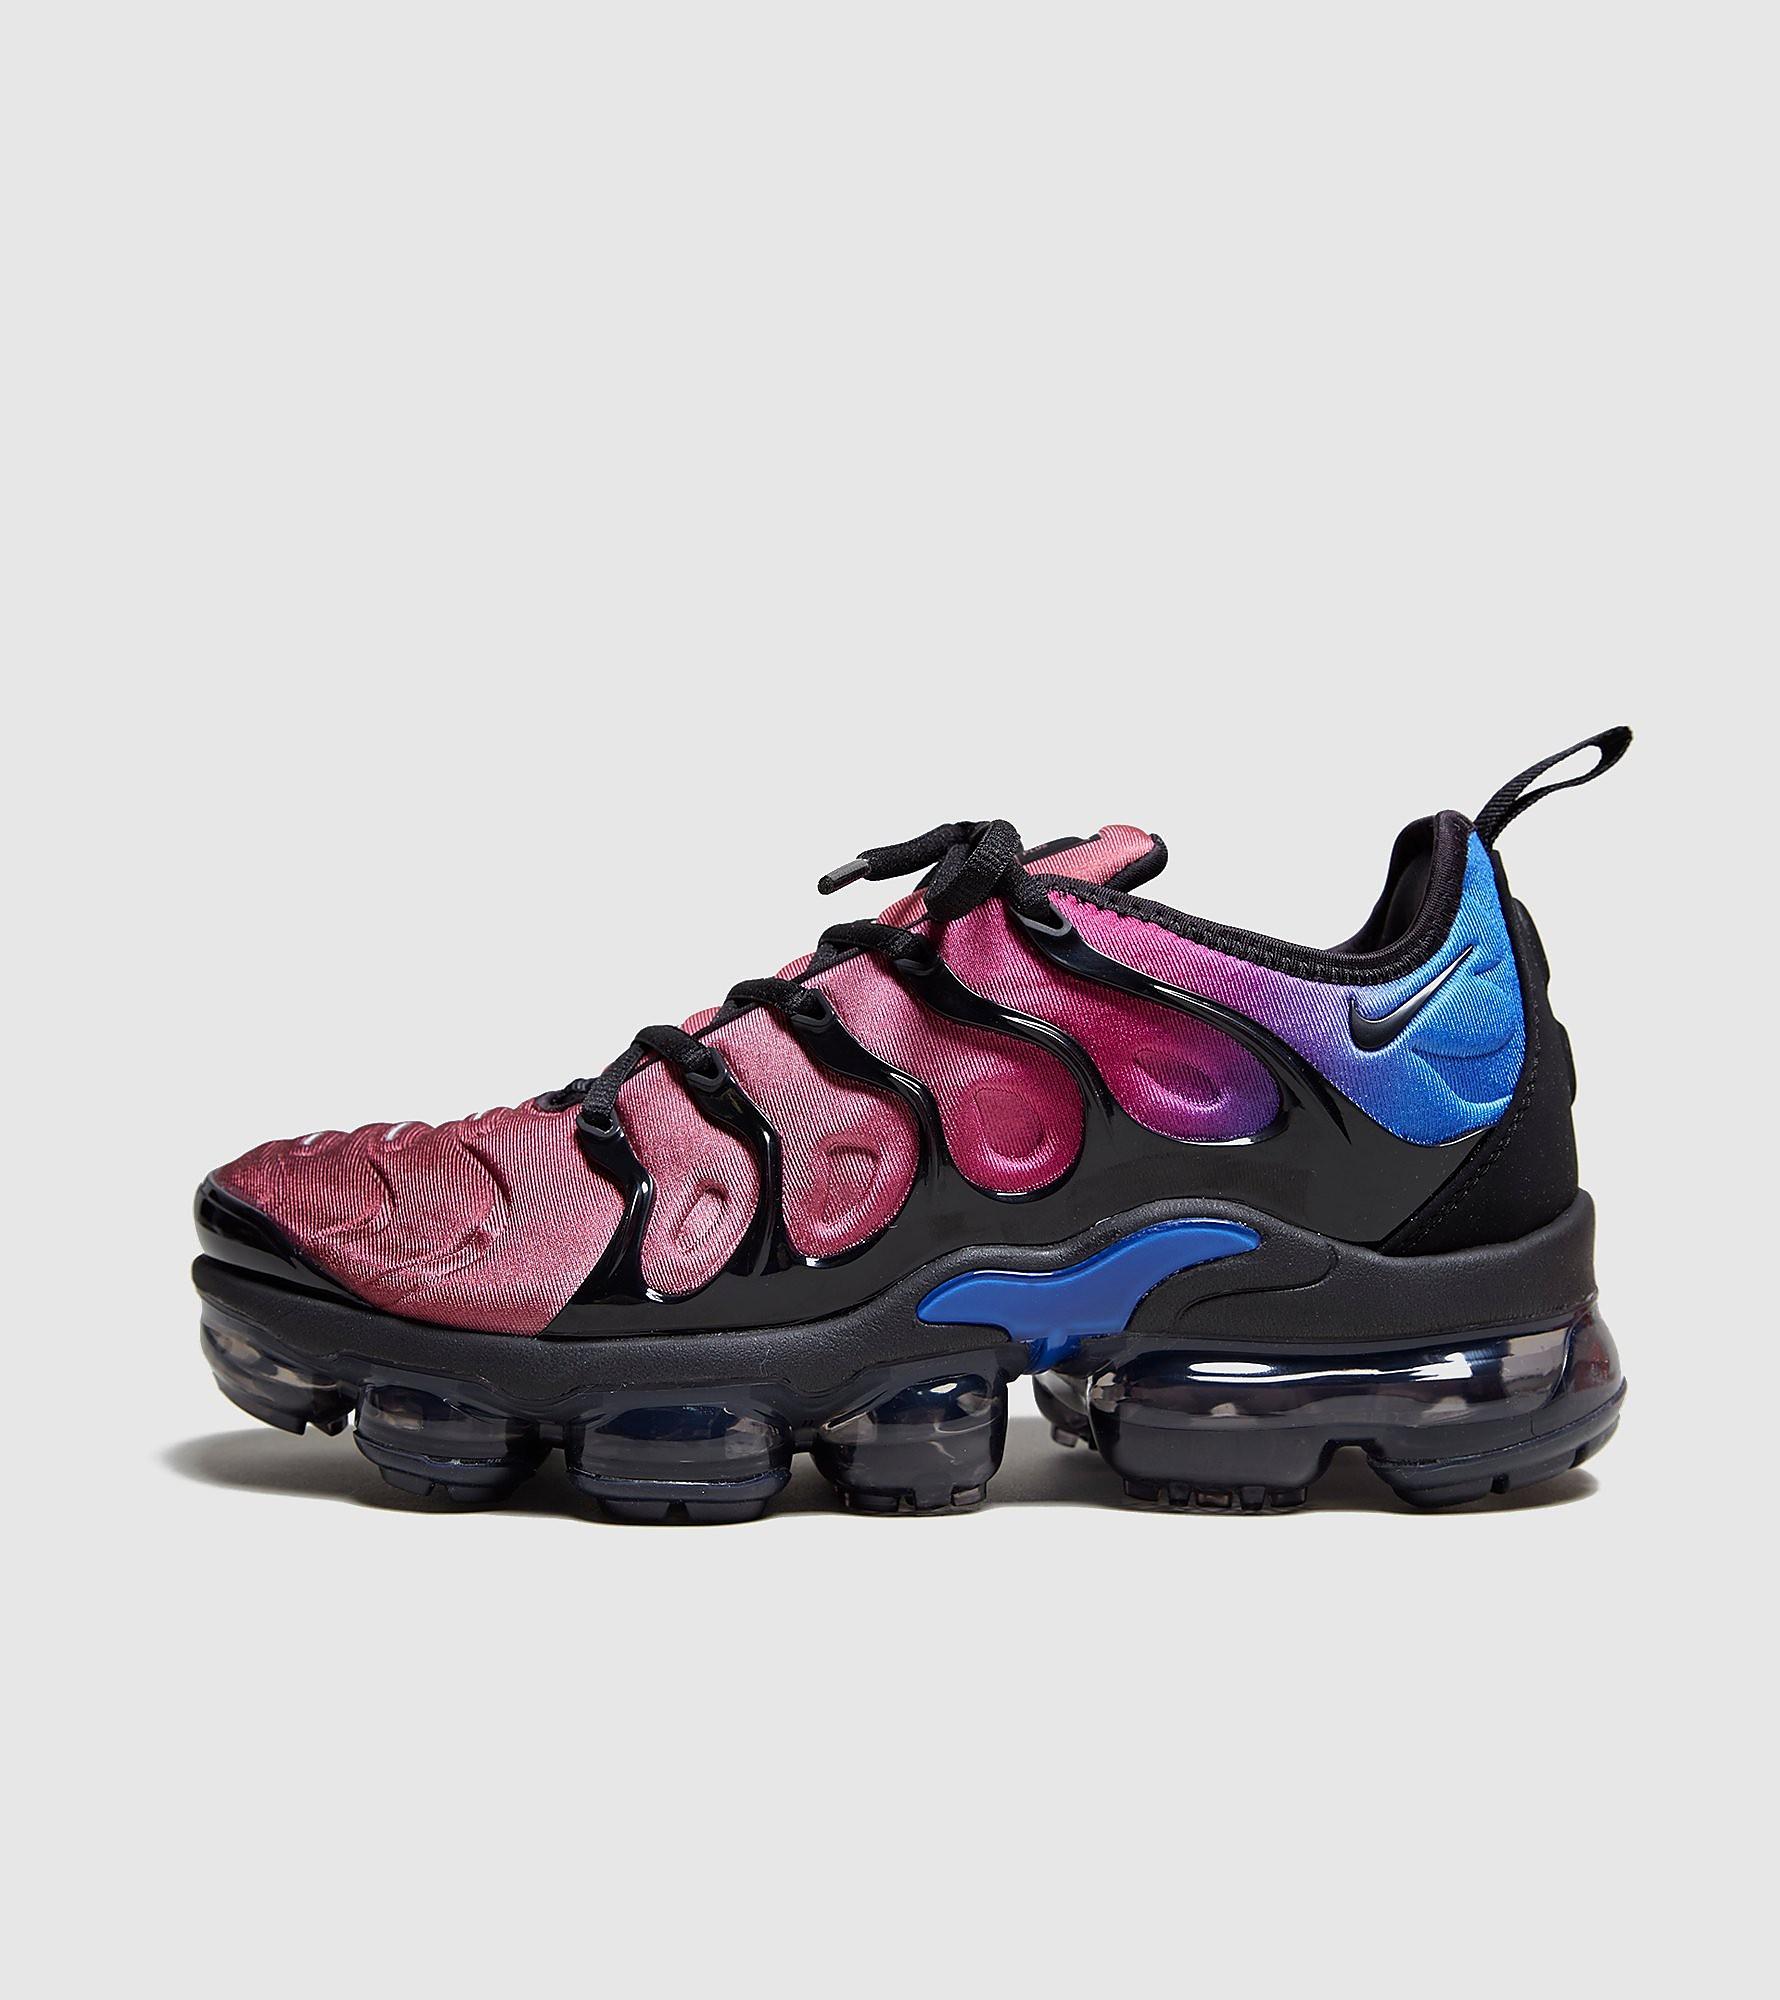 Nike Air VaporMax Plus Women's